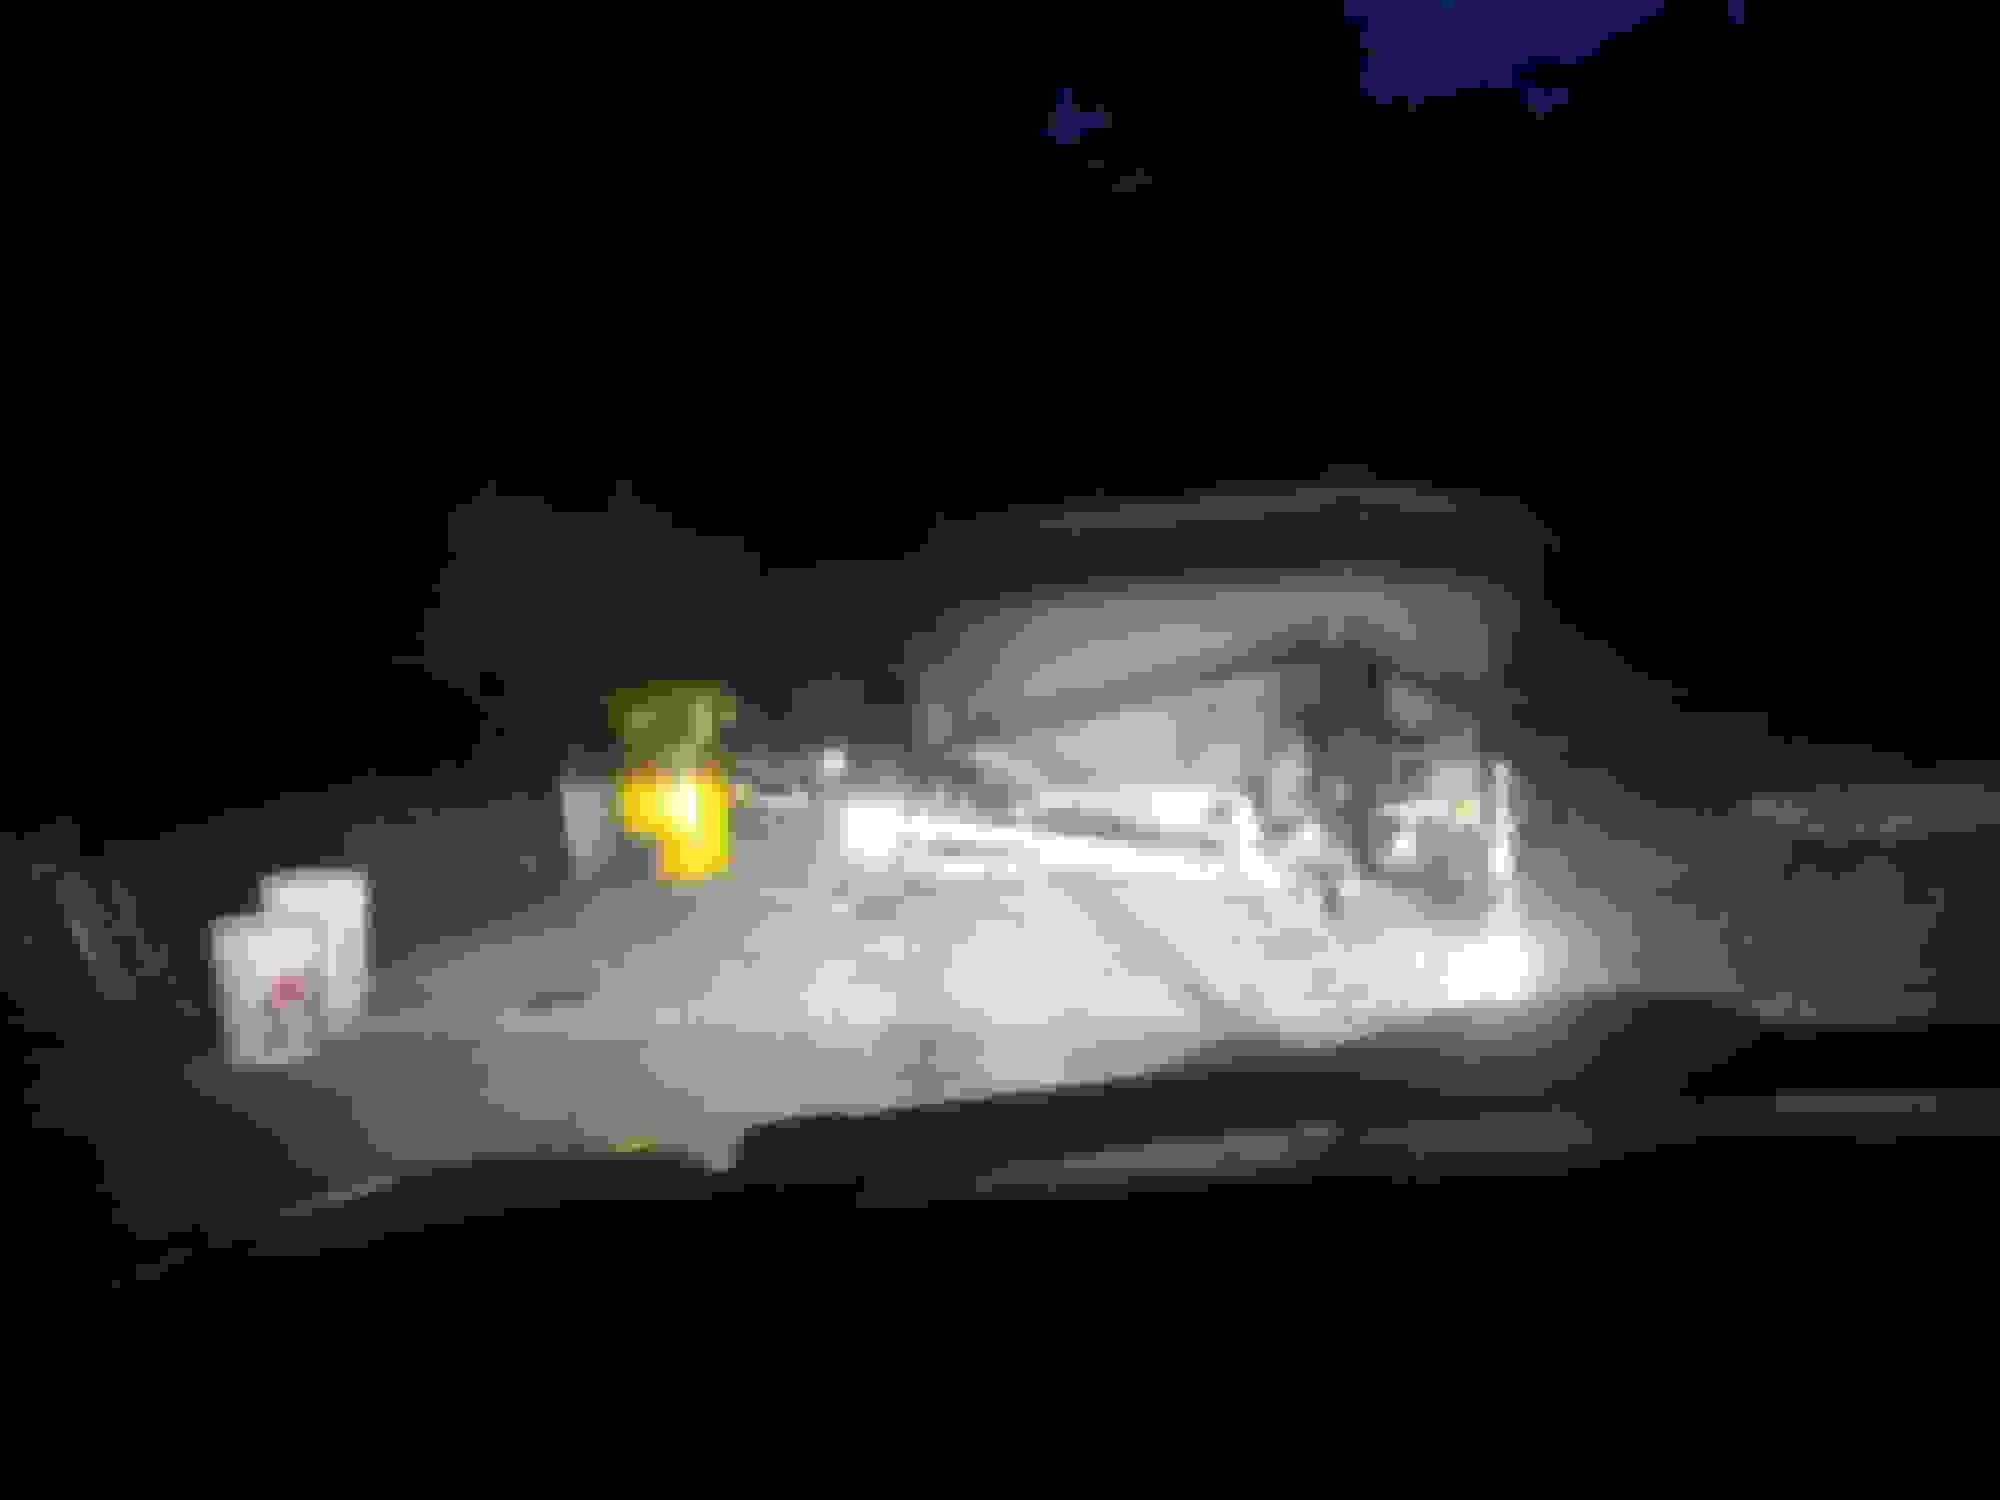 Interior/Exterior DEPO/Helix Projector Headlights Installed